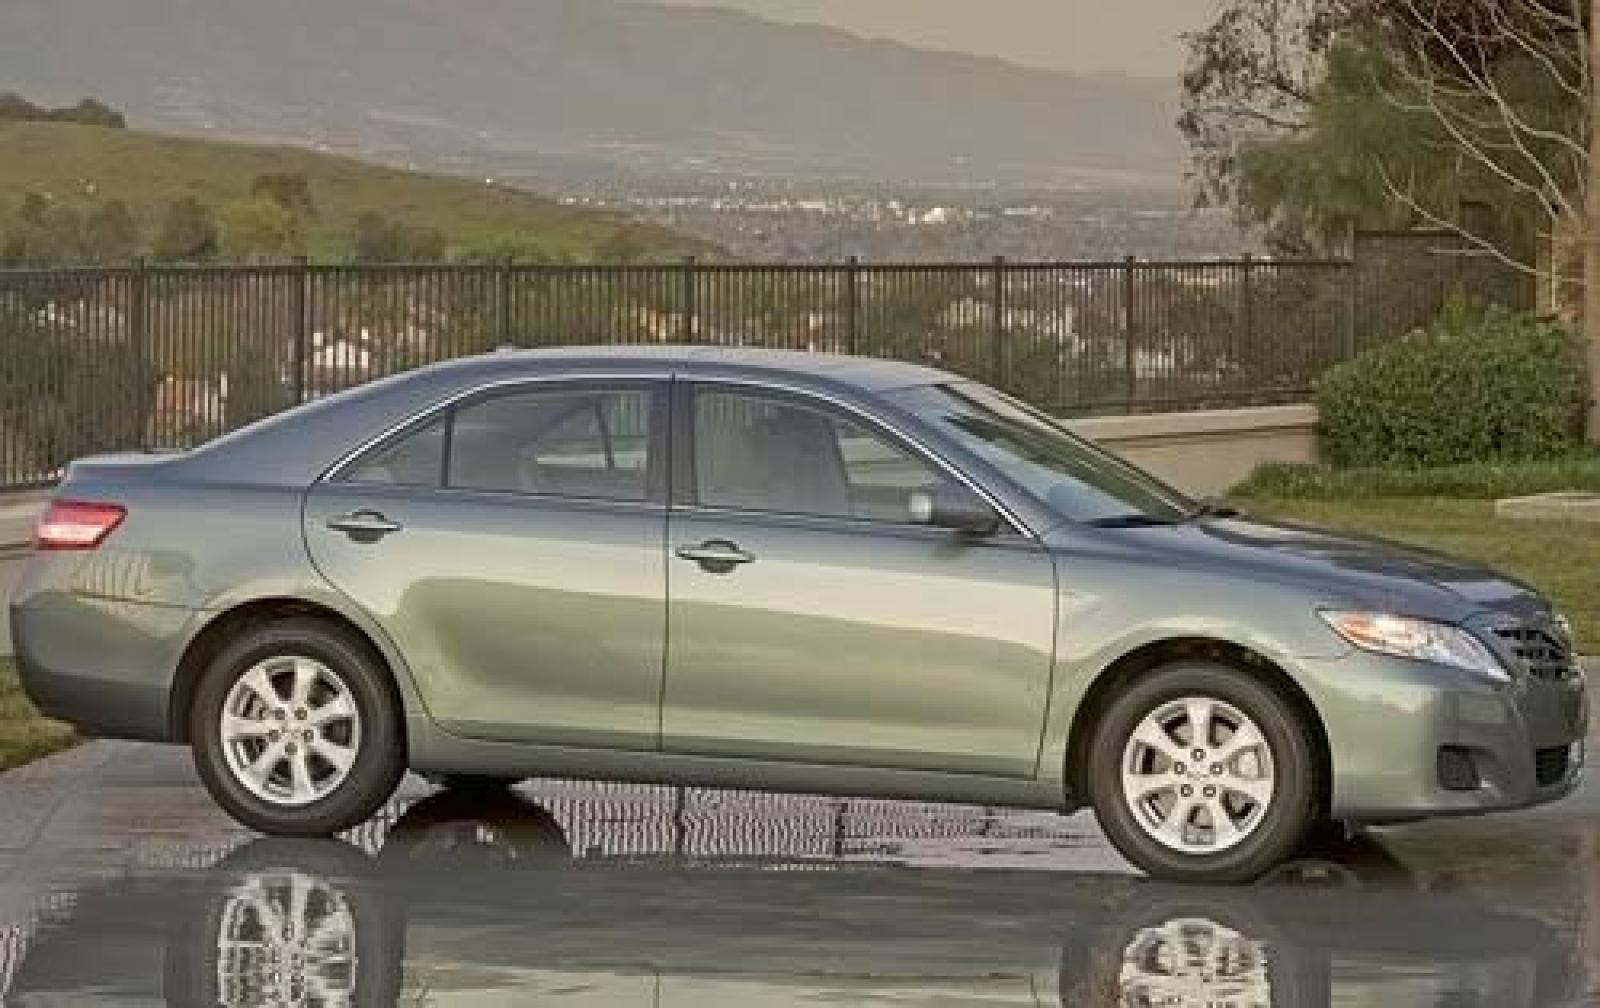 2011 Toyota Camry Information And Photos Zombiedrive Interior Le Inte 2 800 1024 1280 1600 Origin